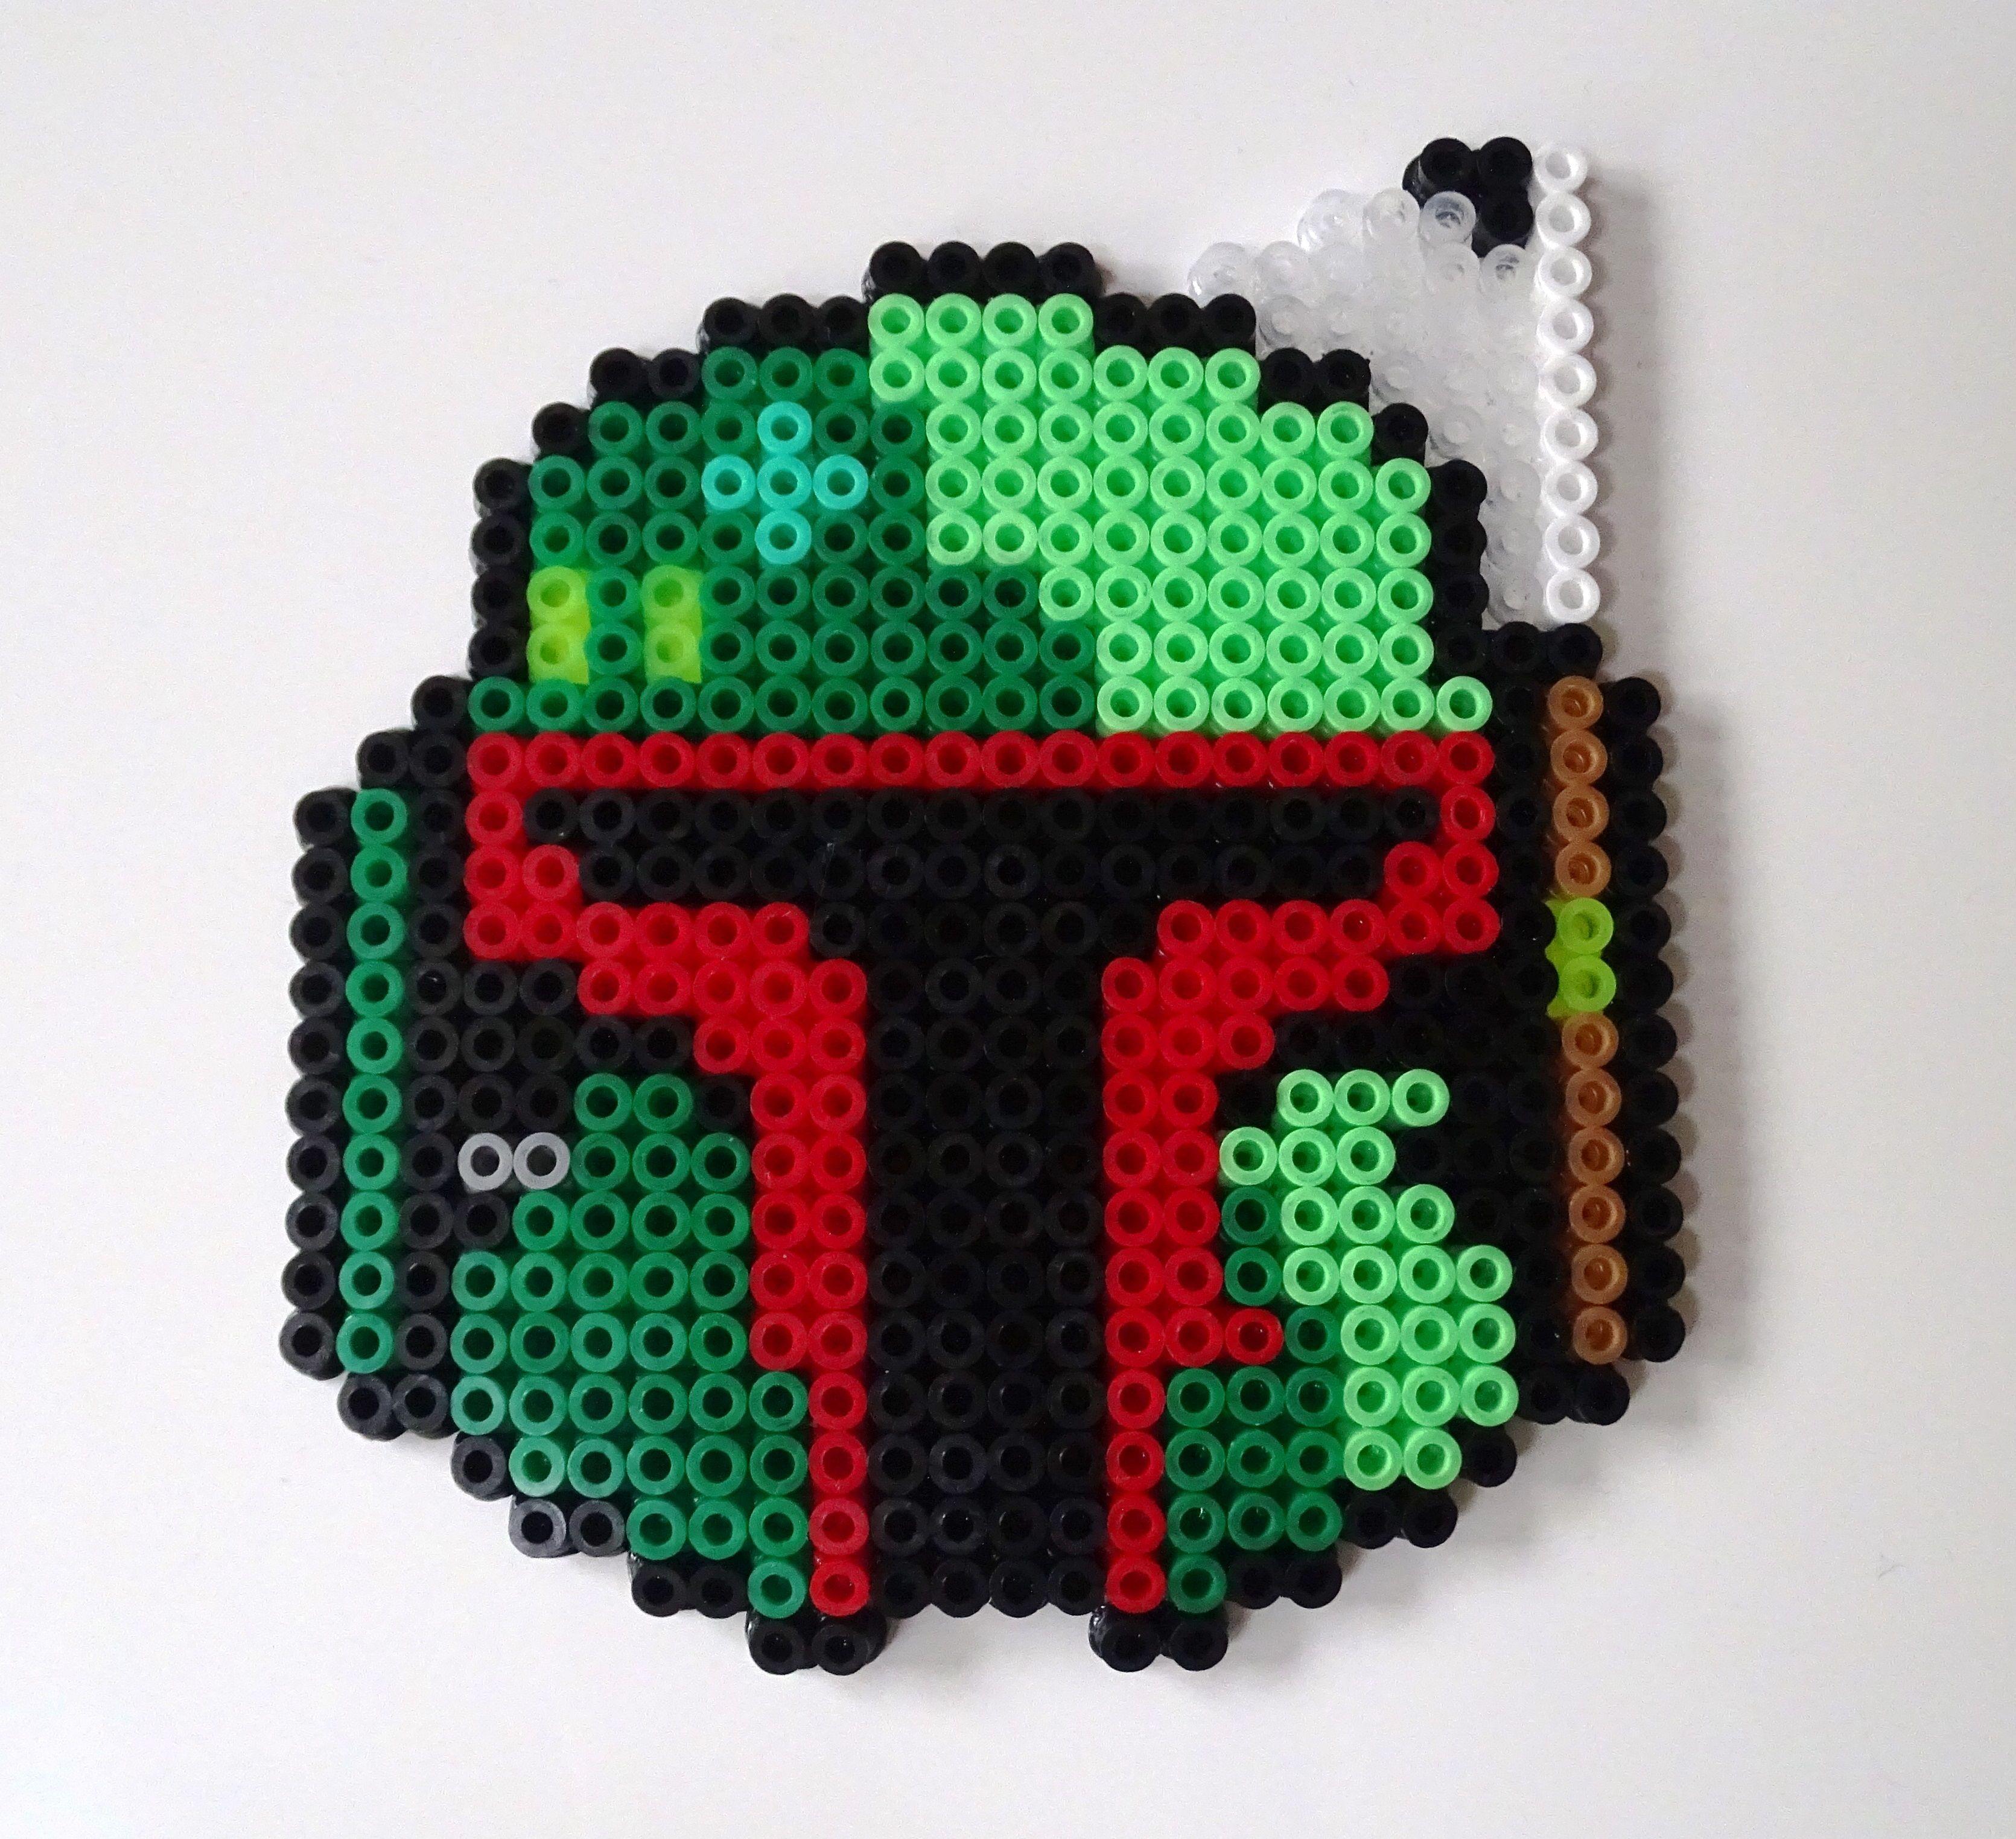 Stormtrooper Star Wars Bugelperlen Hama Perler Beads By